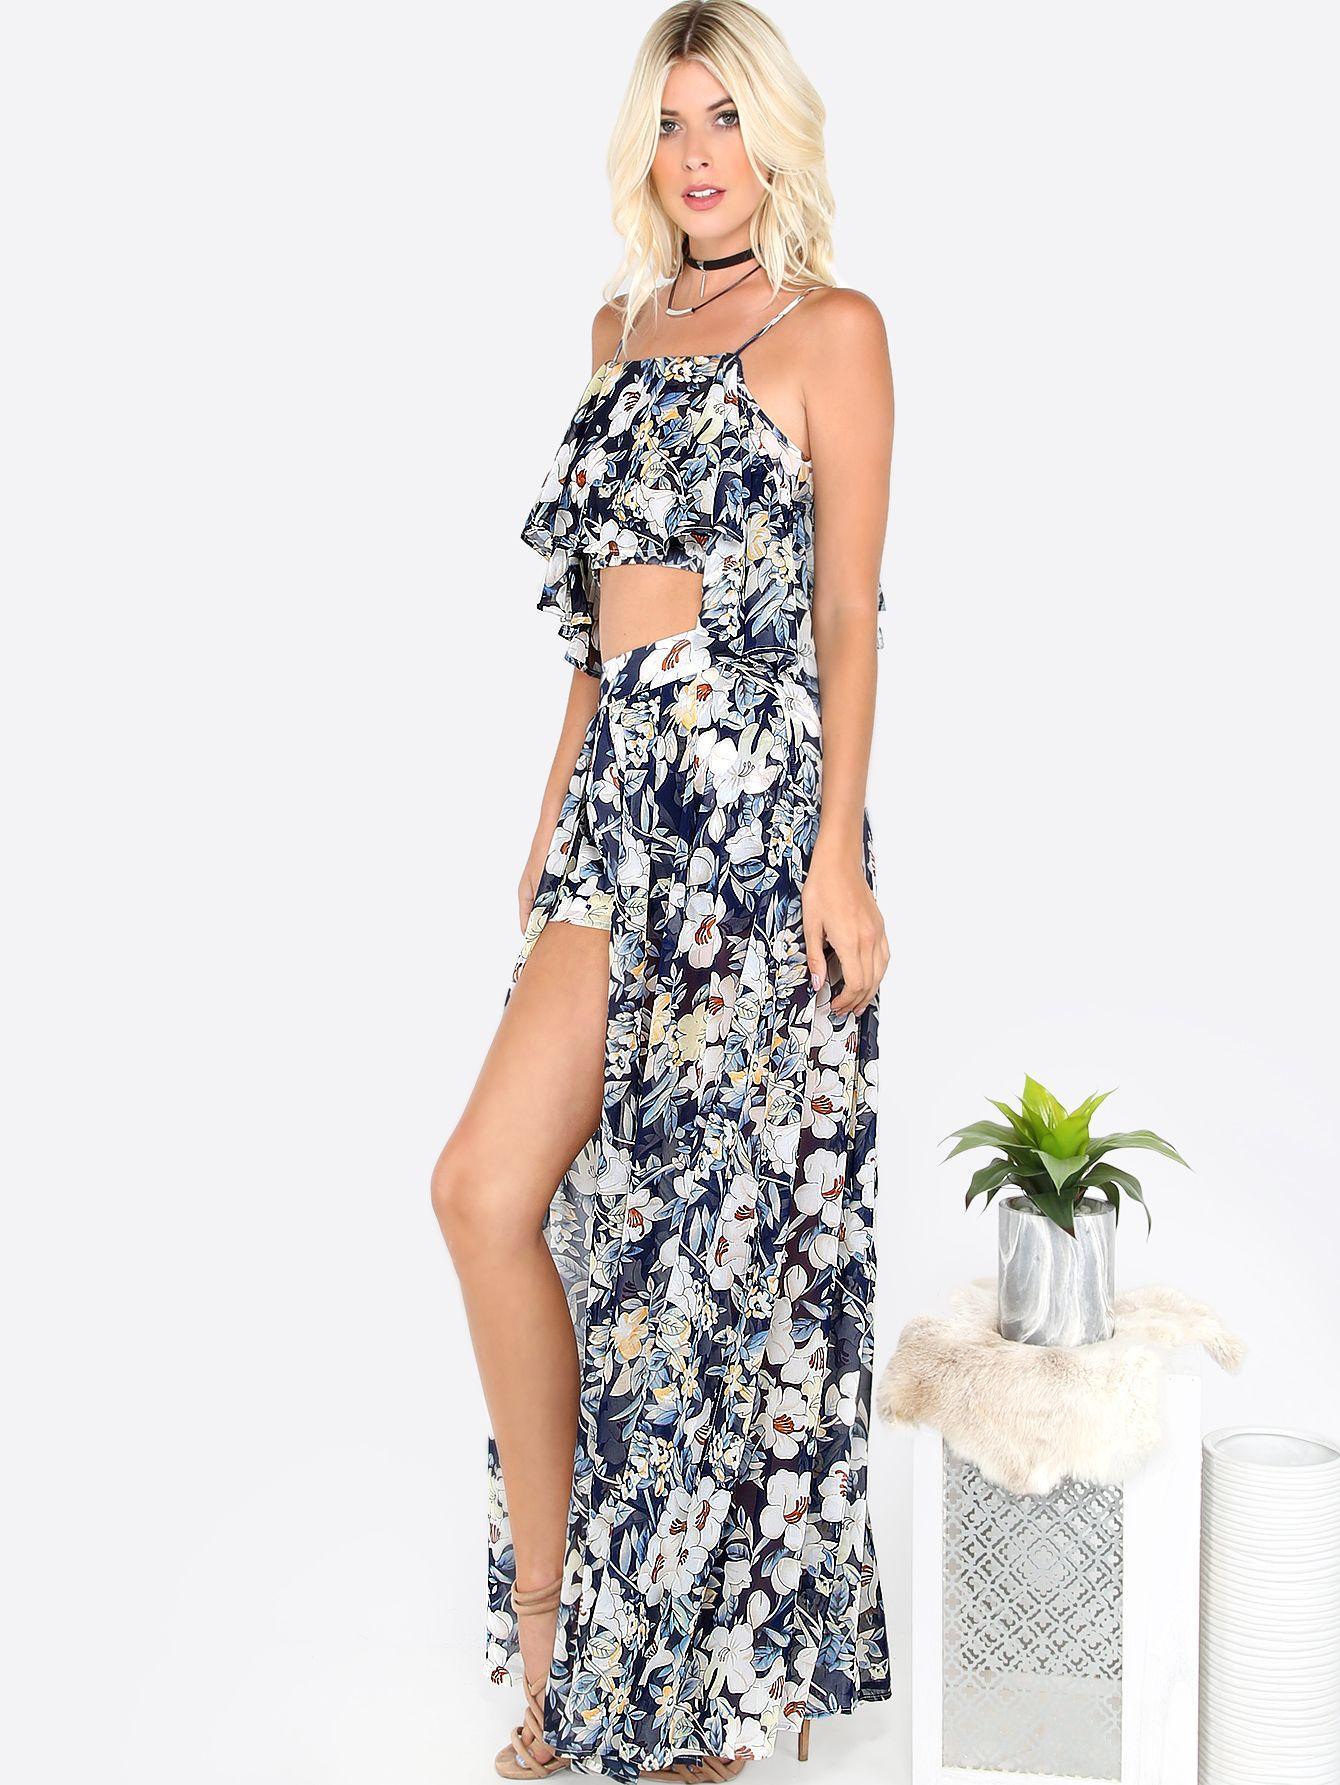 Collection assorti maxi floral avec couche - bleu -French SheIn(Sheinside)